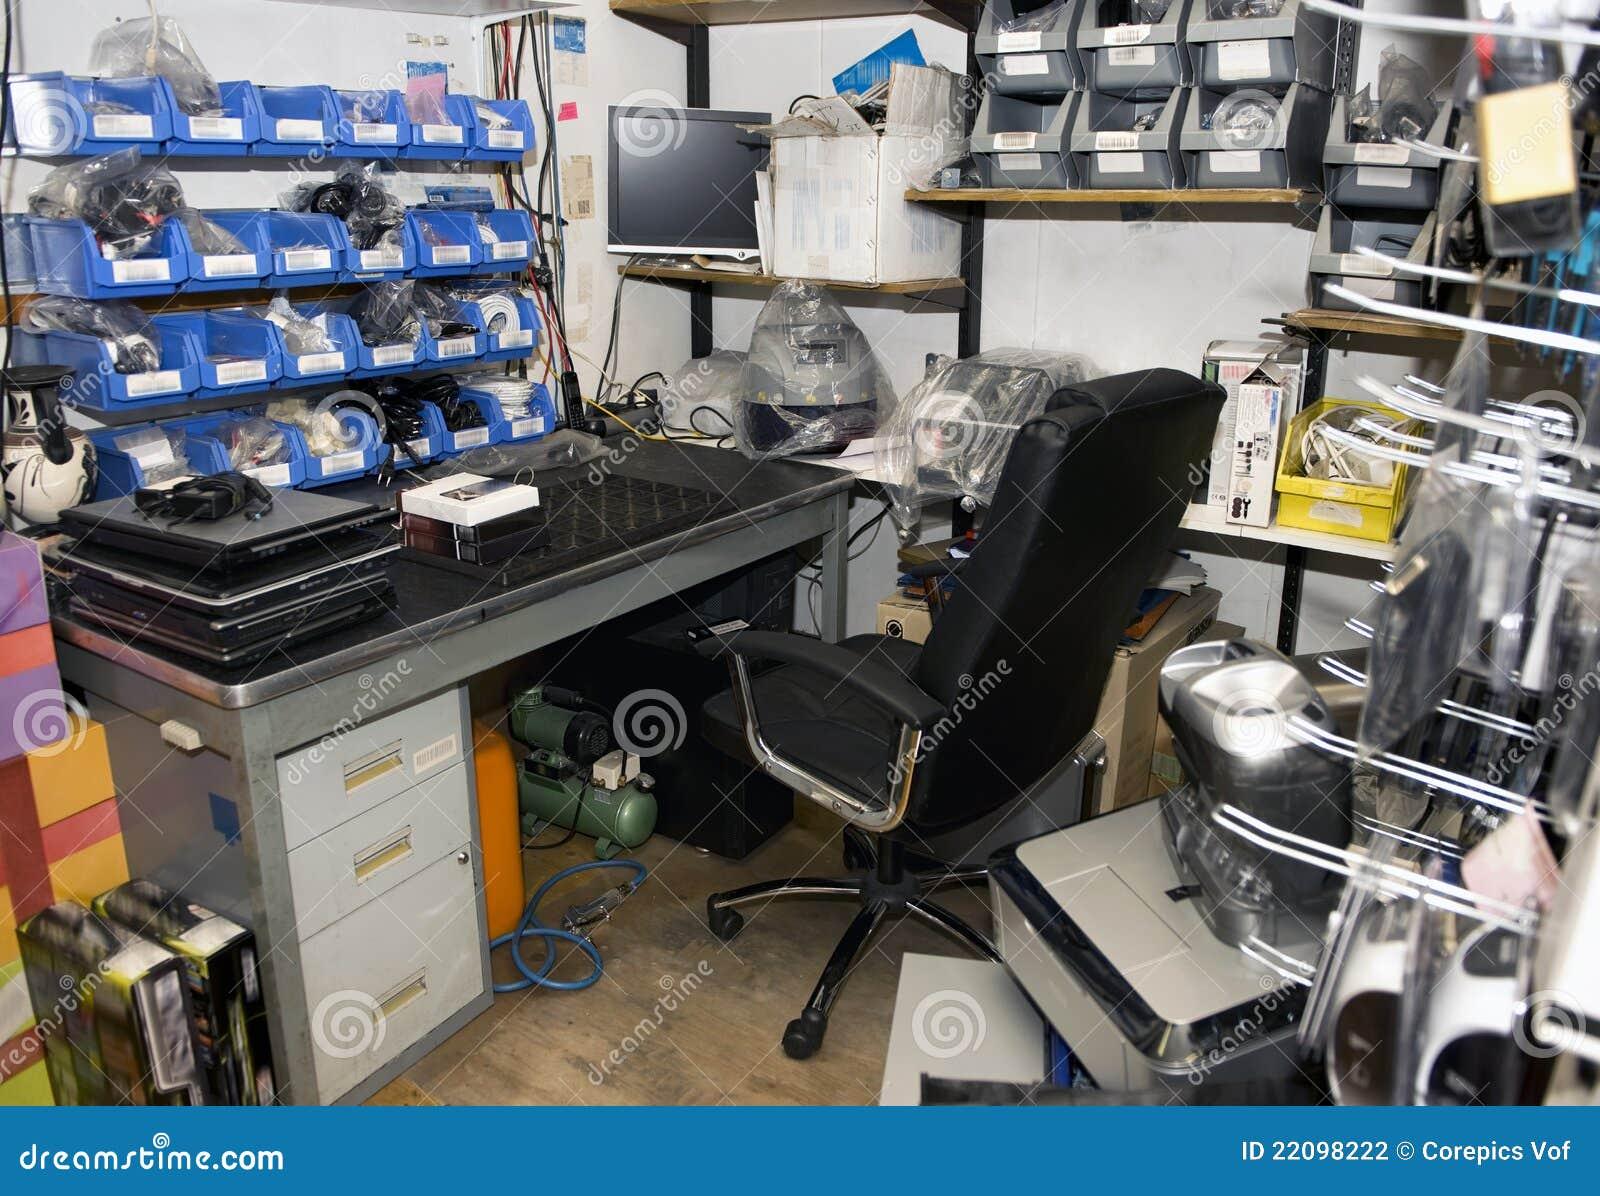 Untidy Computer Room Stock Photo Image Of Racks Spare